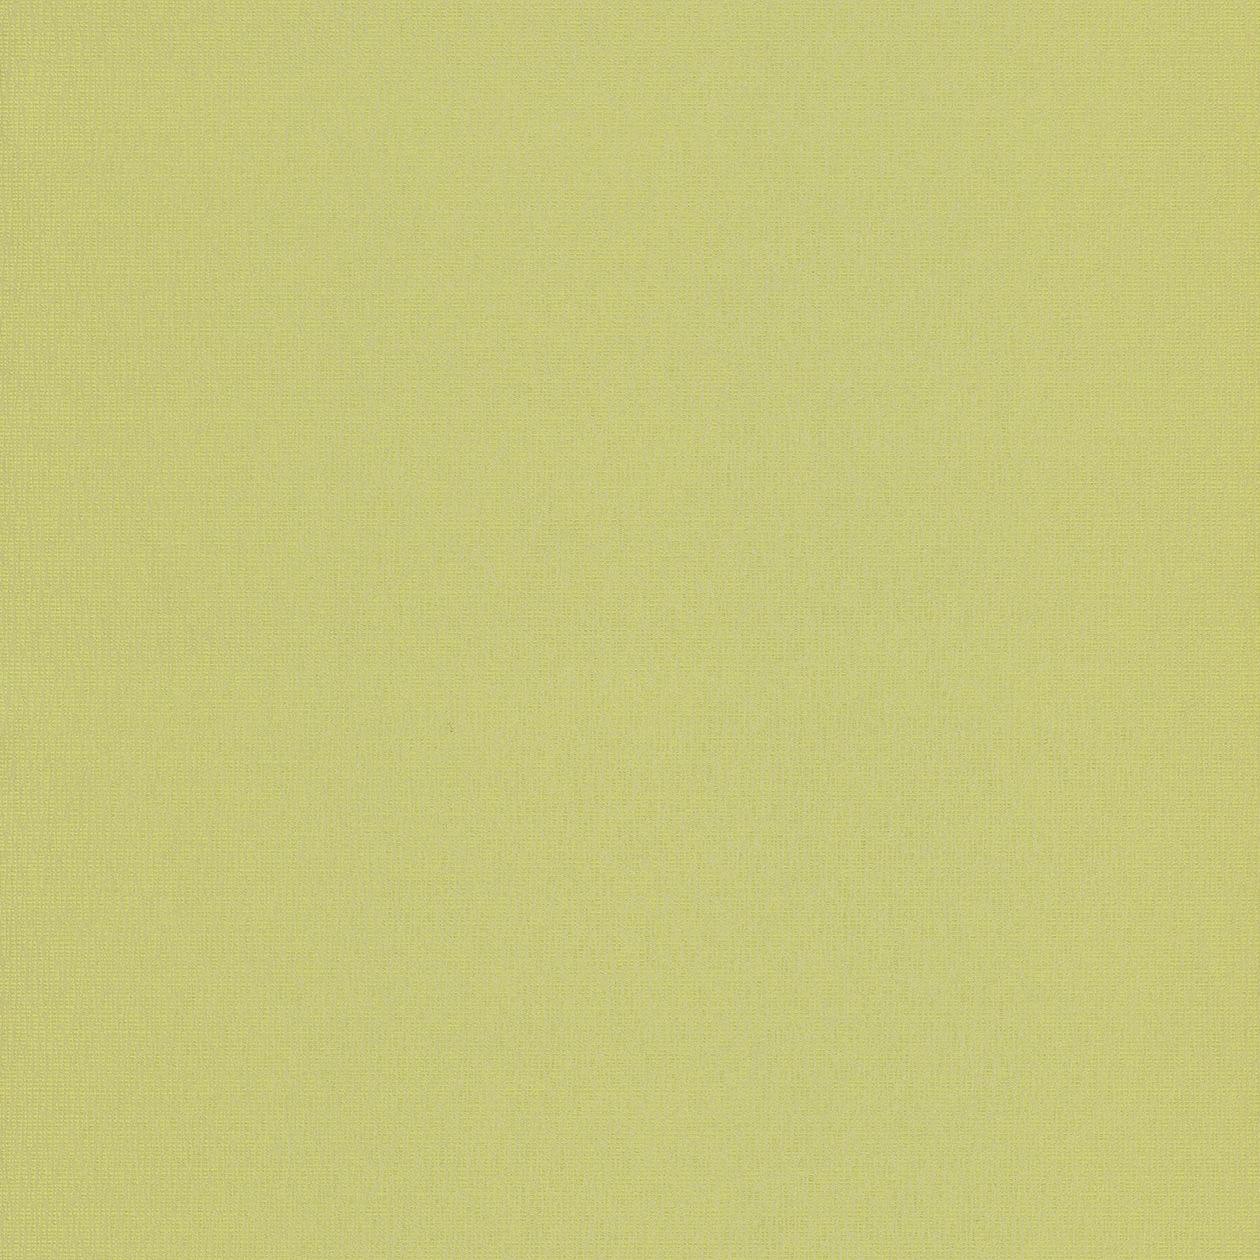 Французские обои Caselio,  коллекция Trio, артикулTIO68007099